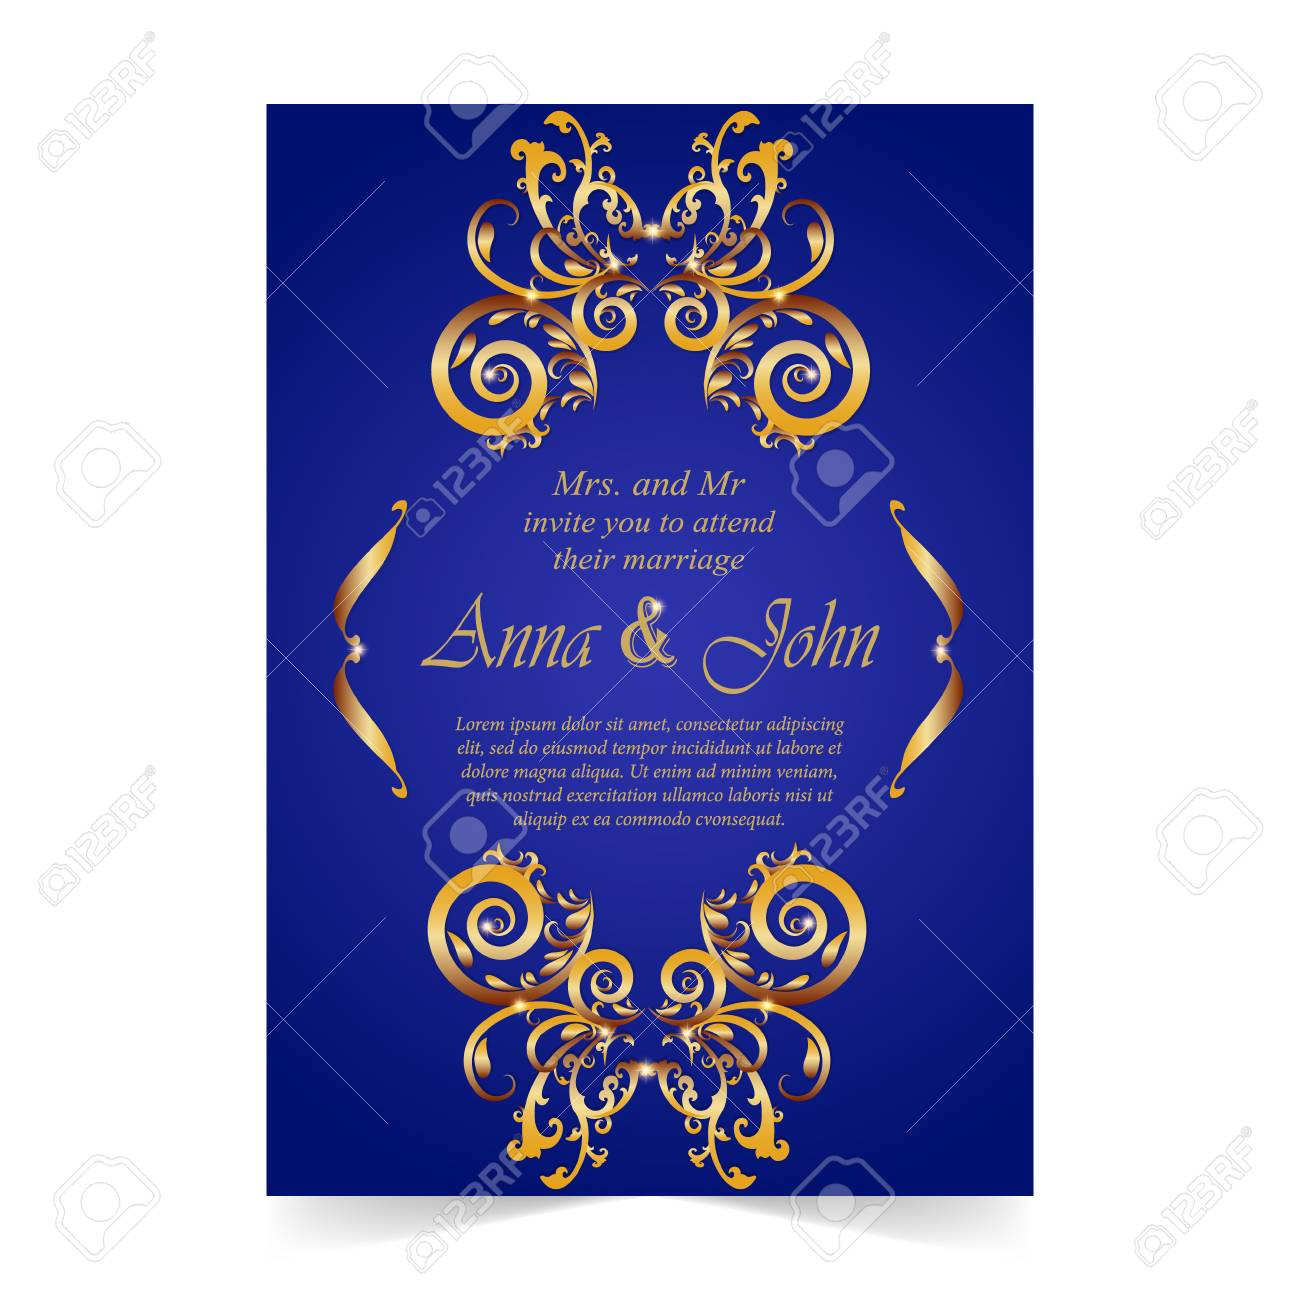 wedding card invitation card with ornamental on royal blue background